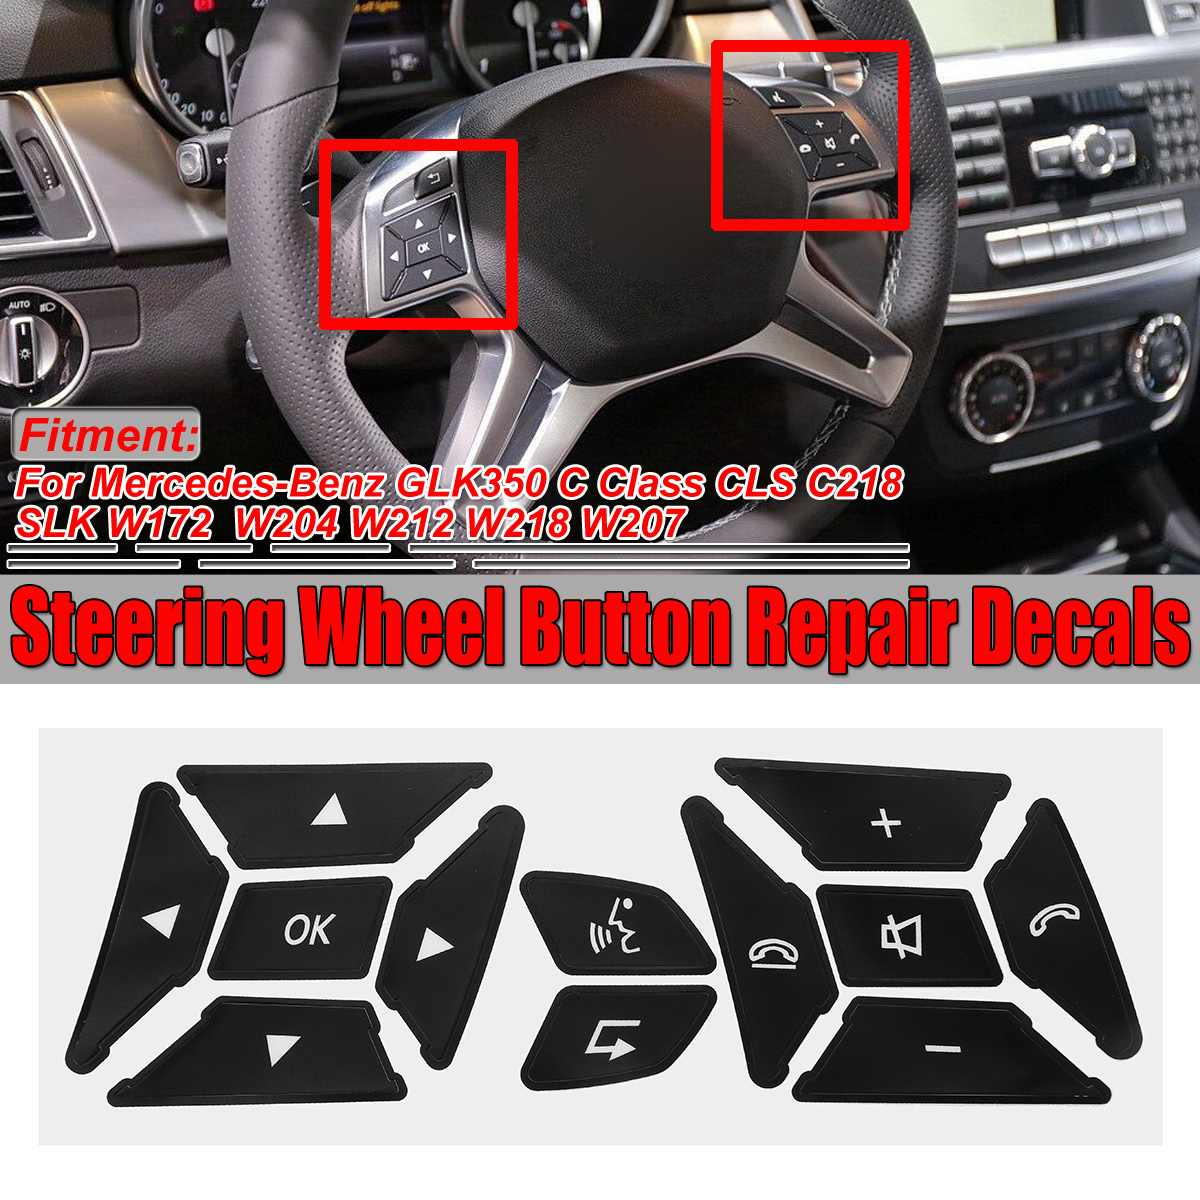 VALVE STEM CAPS SET Mercedes-Benz R172 SLK 200 250 350 CDI BlueEFFICIENCY 55 AMG